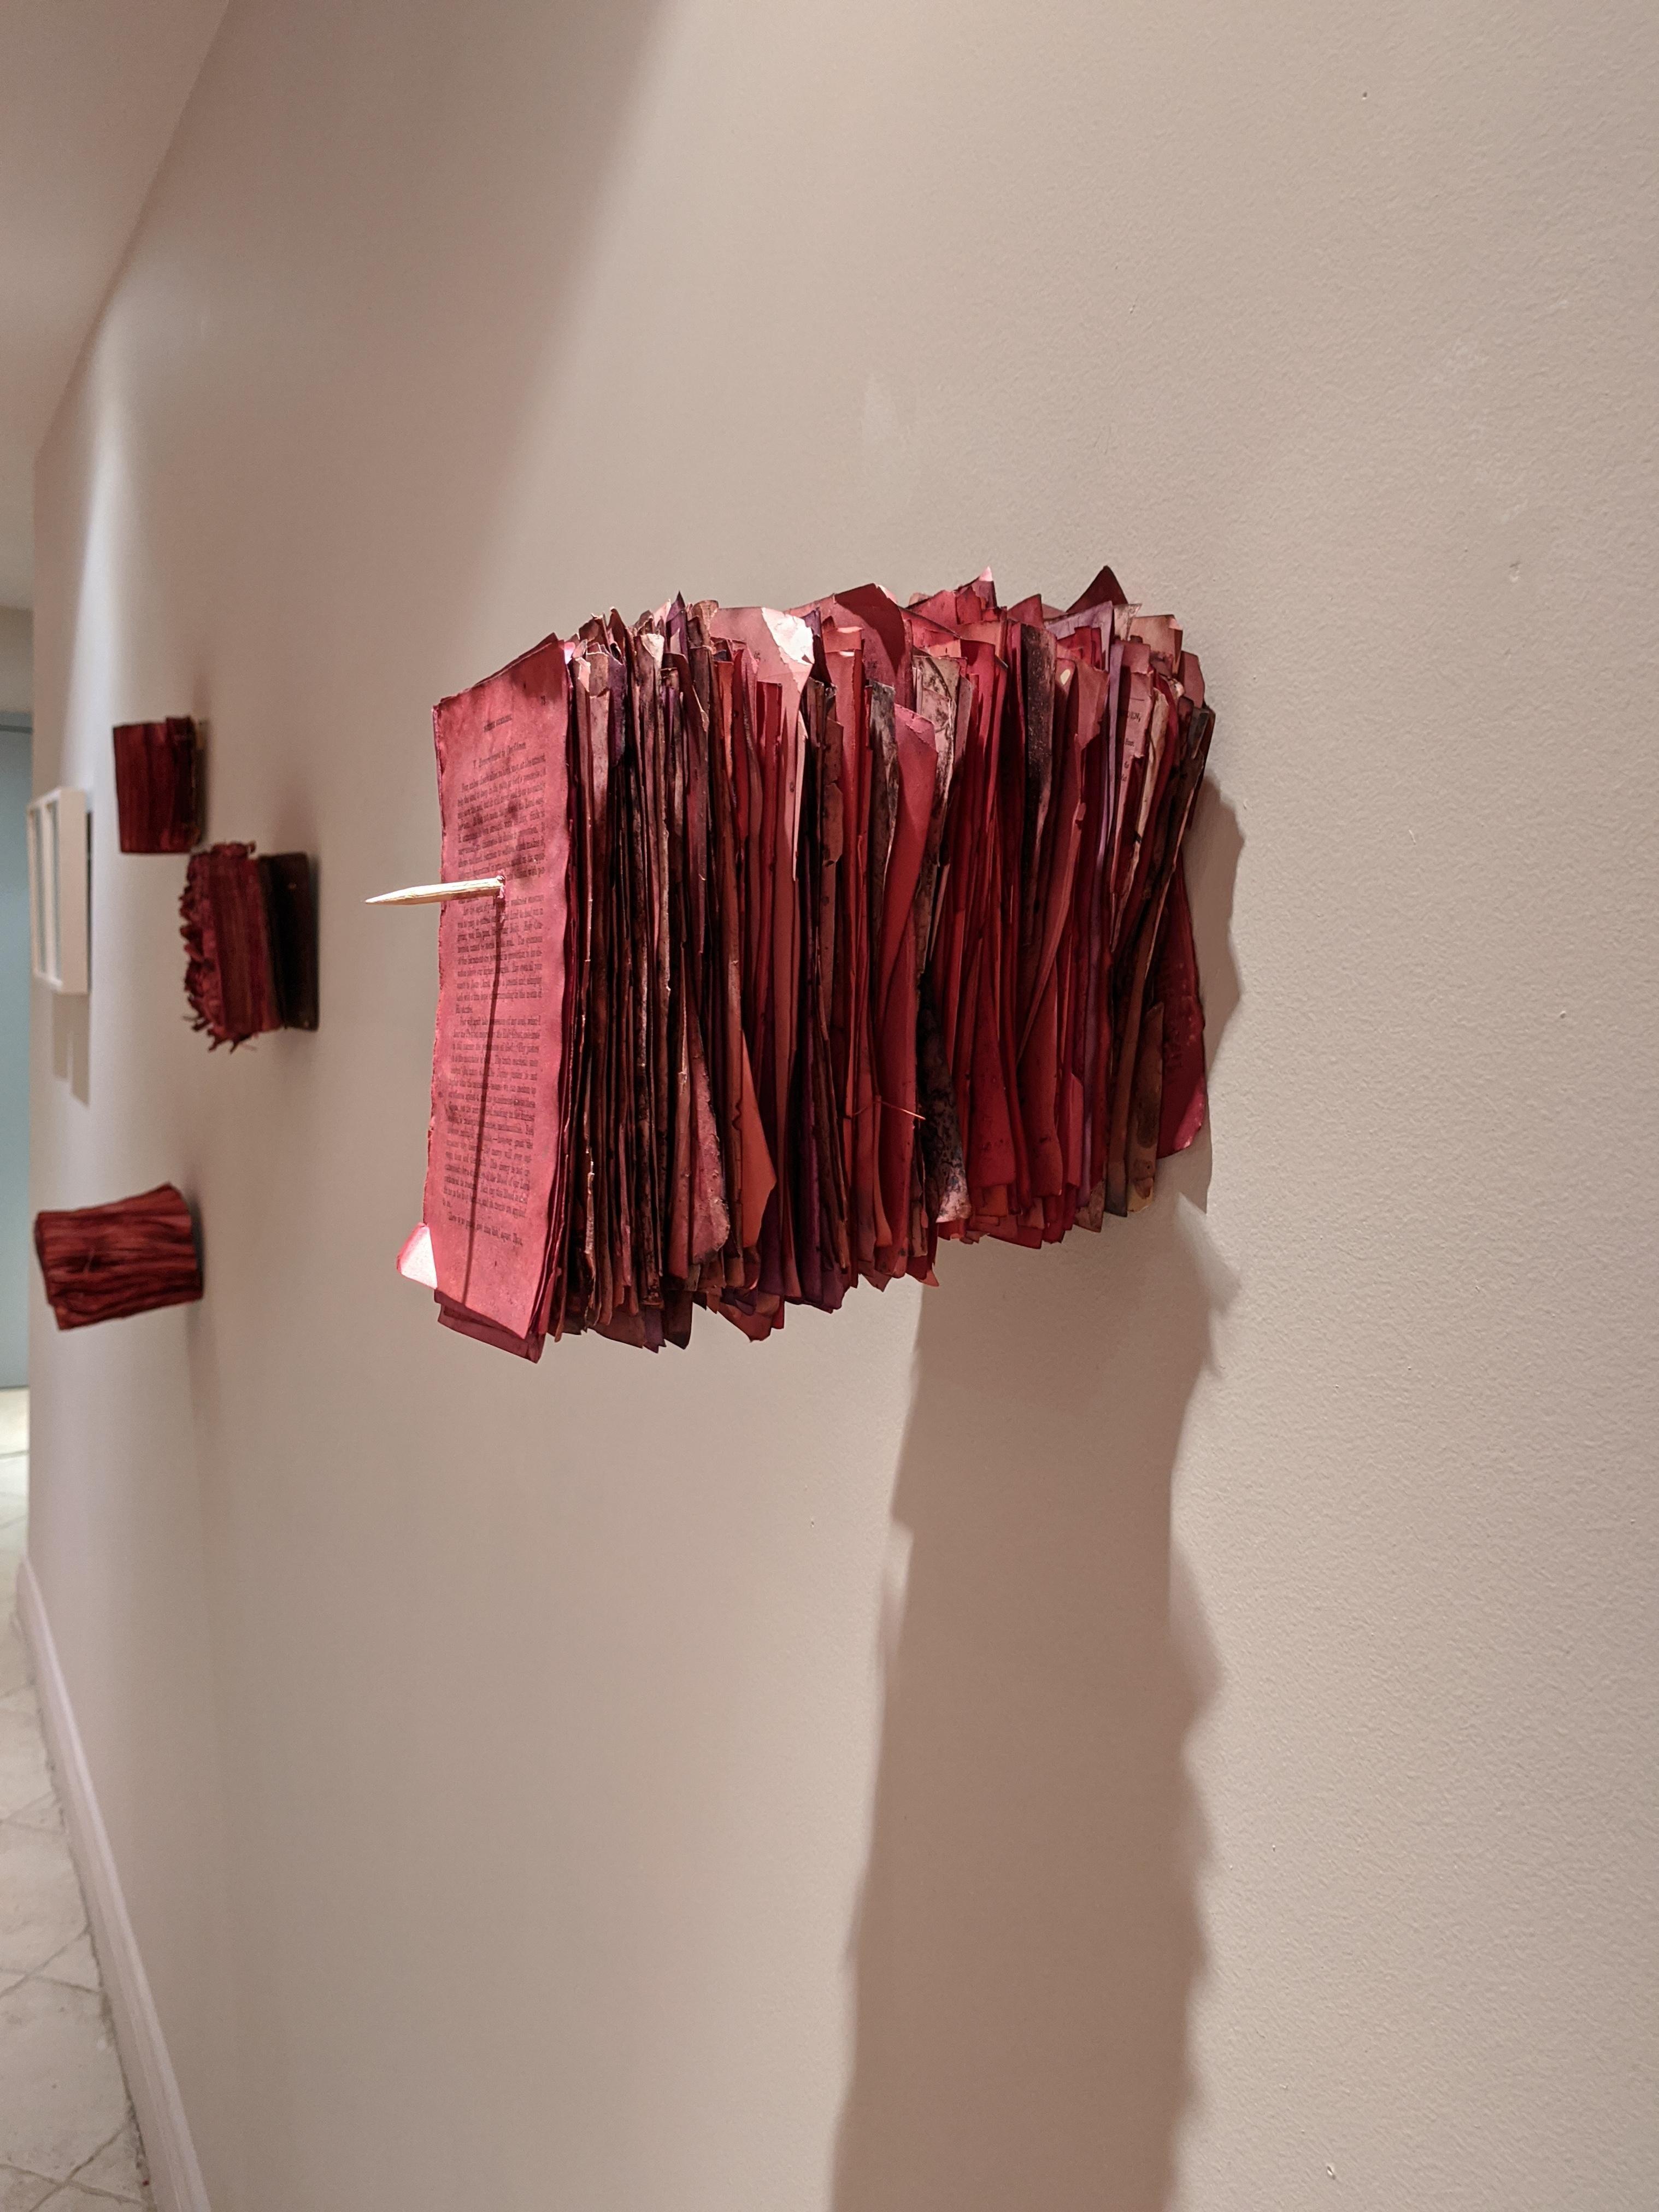 Patricia Miranda, Florilegium Series, 2016, cochineal dyes, antique books, pearl